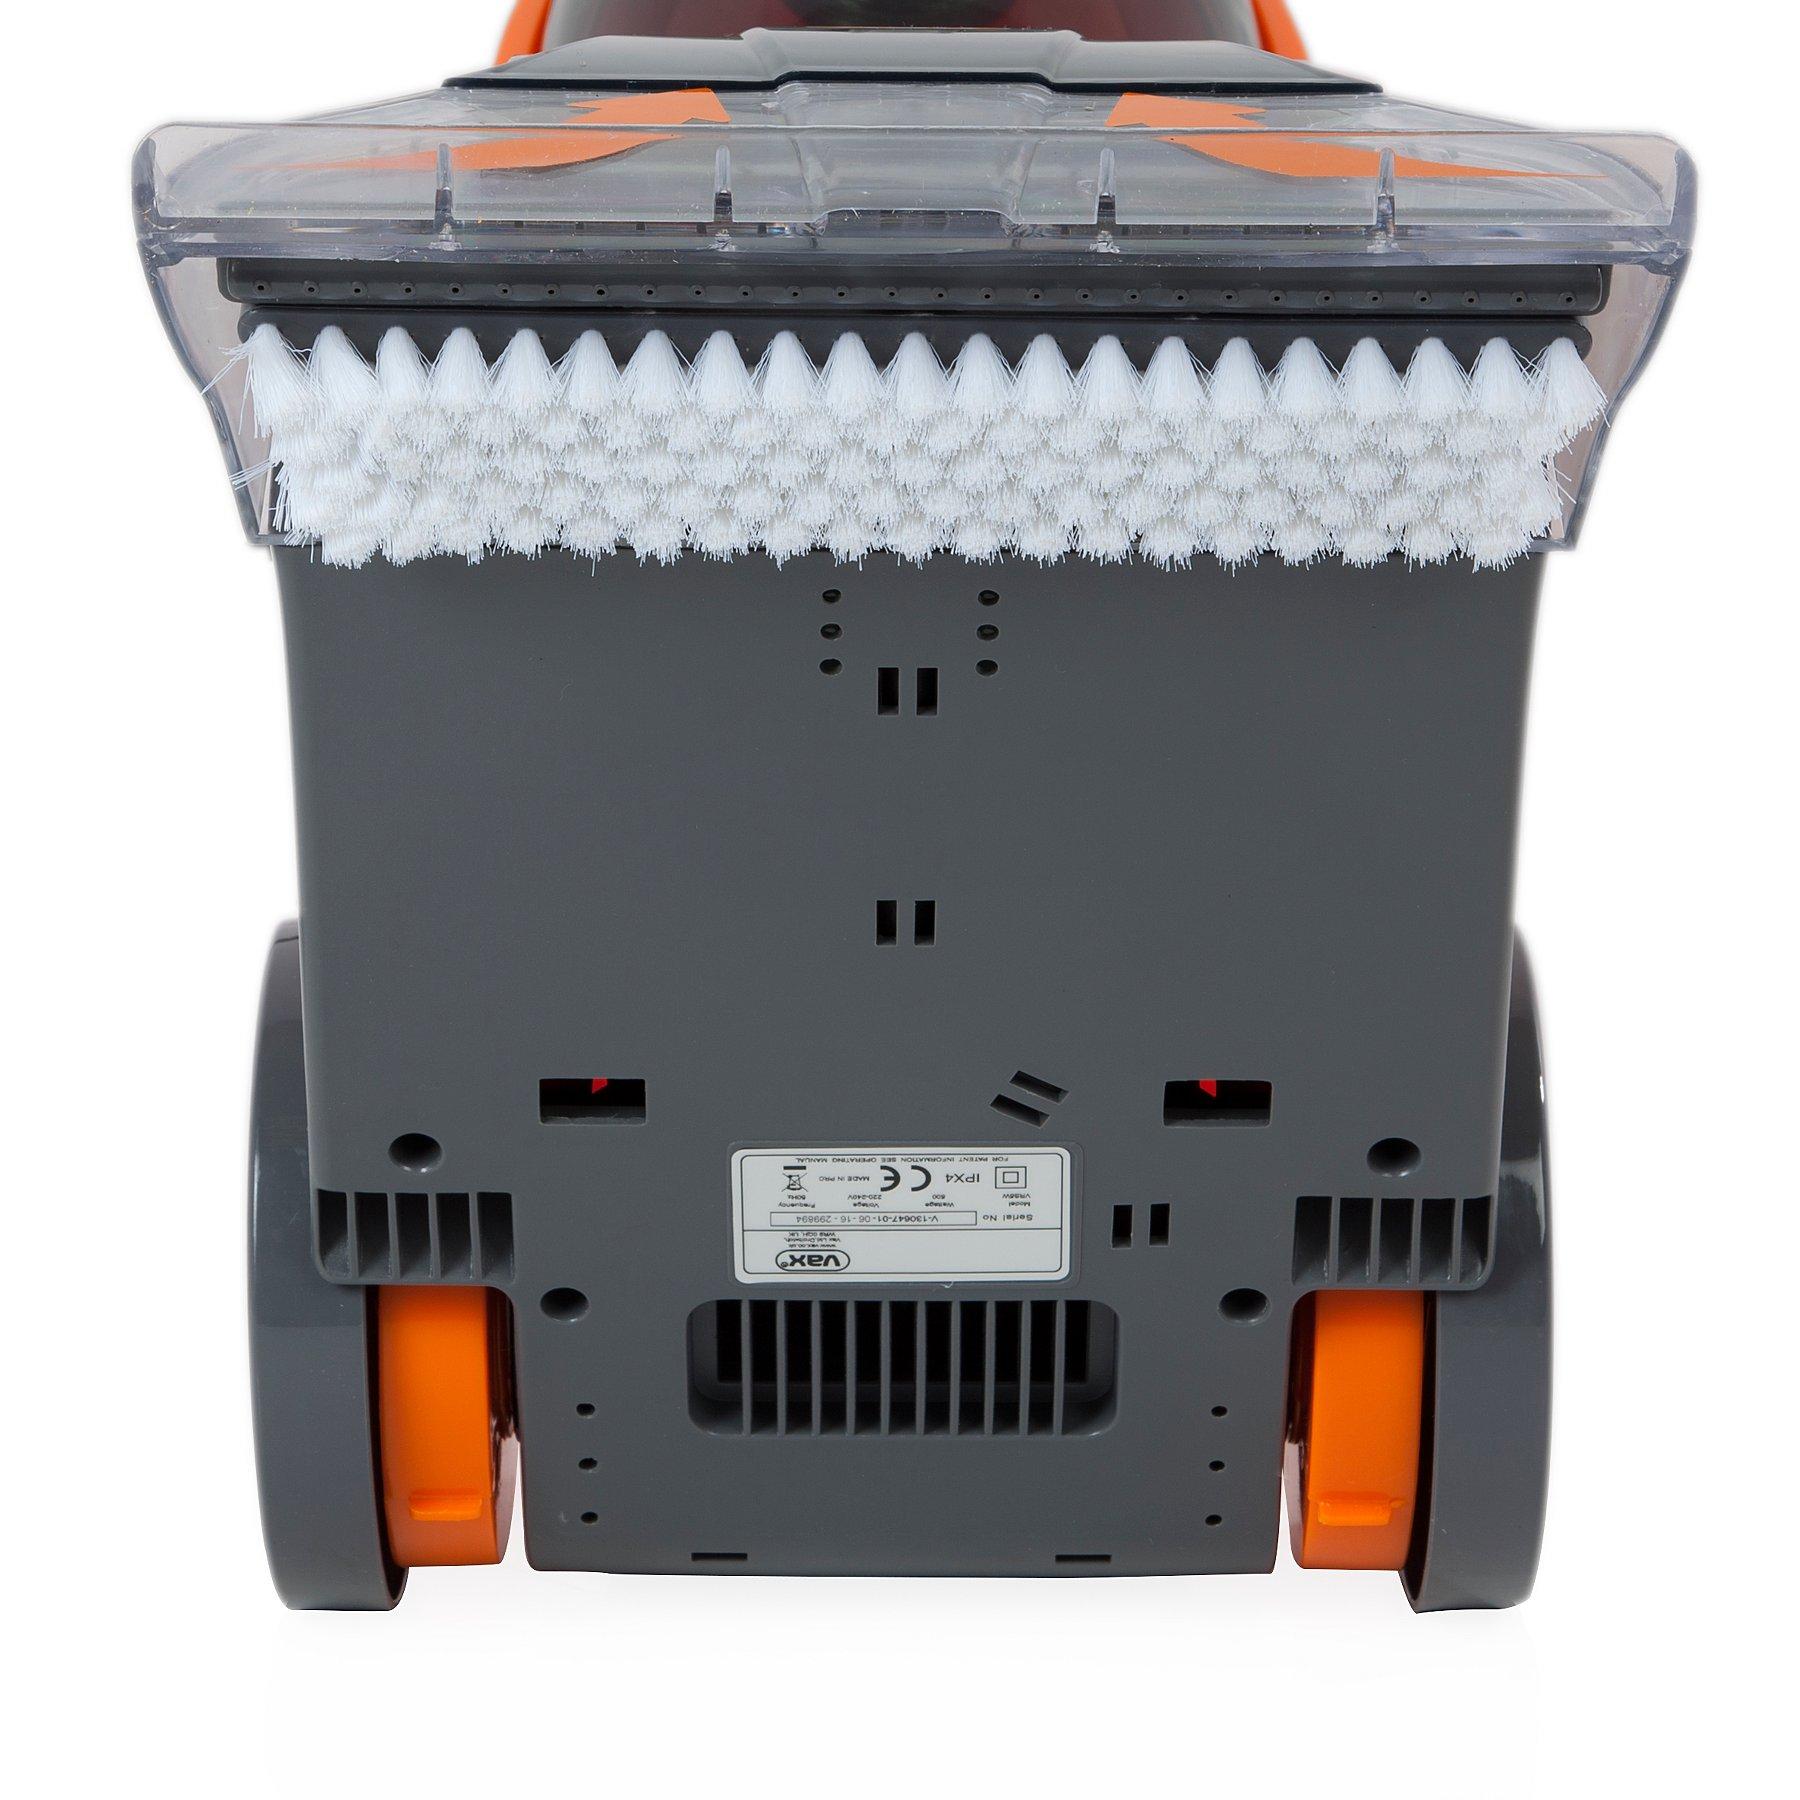 Vax VRS5W Powermax Carpet Washer - Orange. Reset